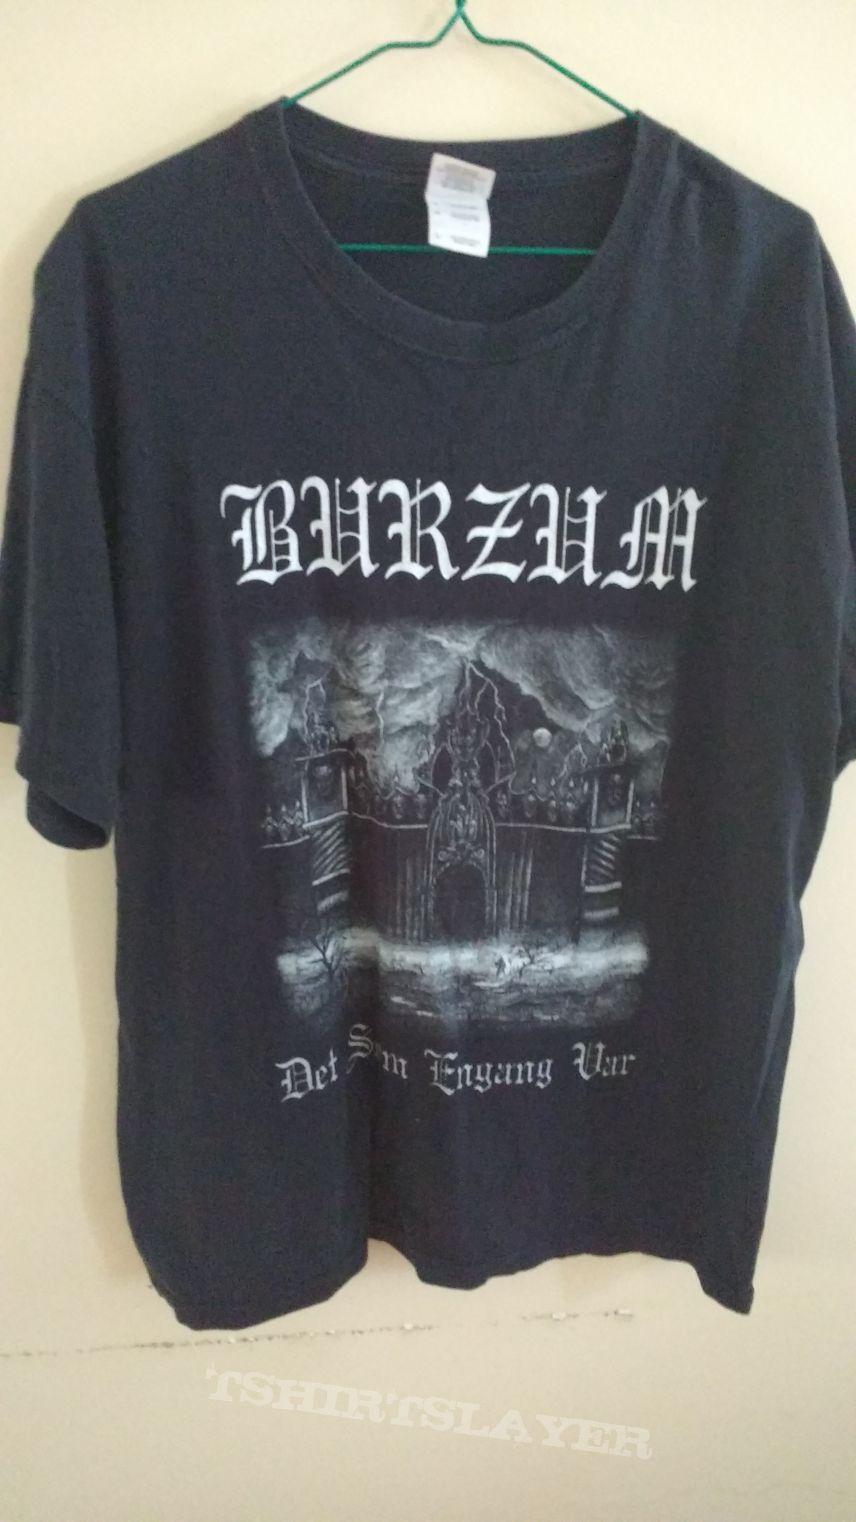 Burzum - Det Som Engang Var Shirt